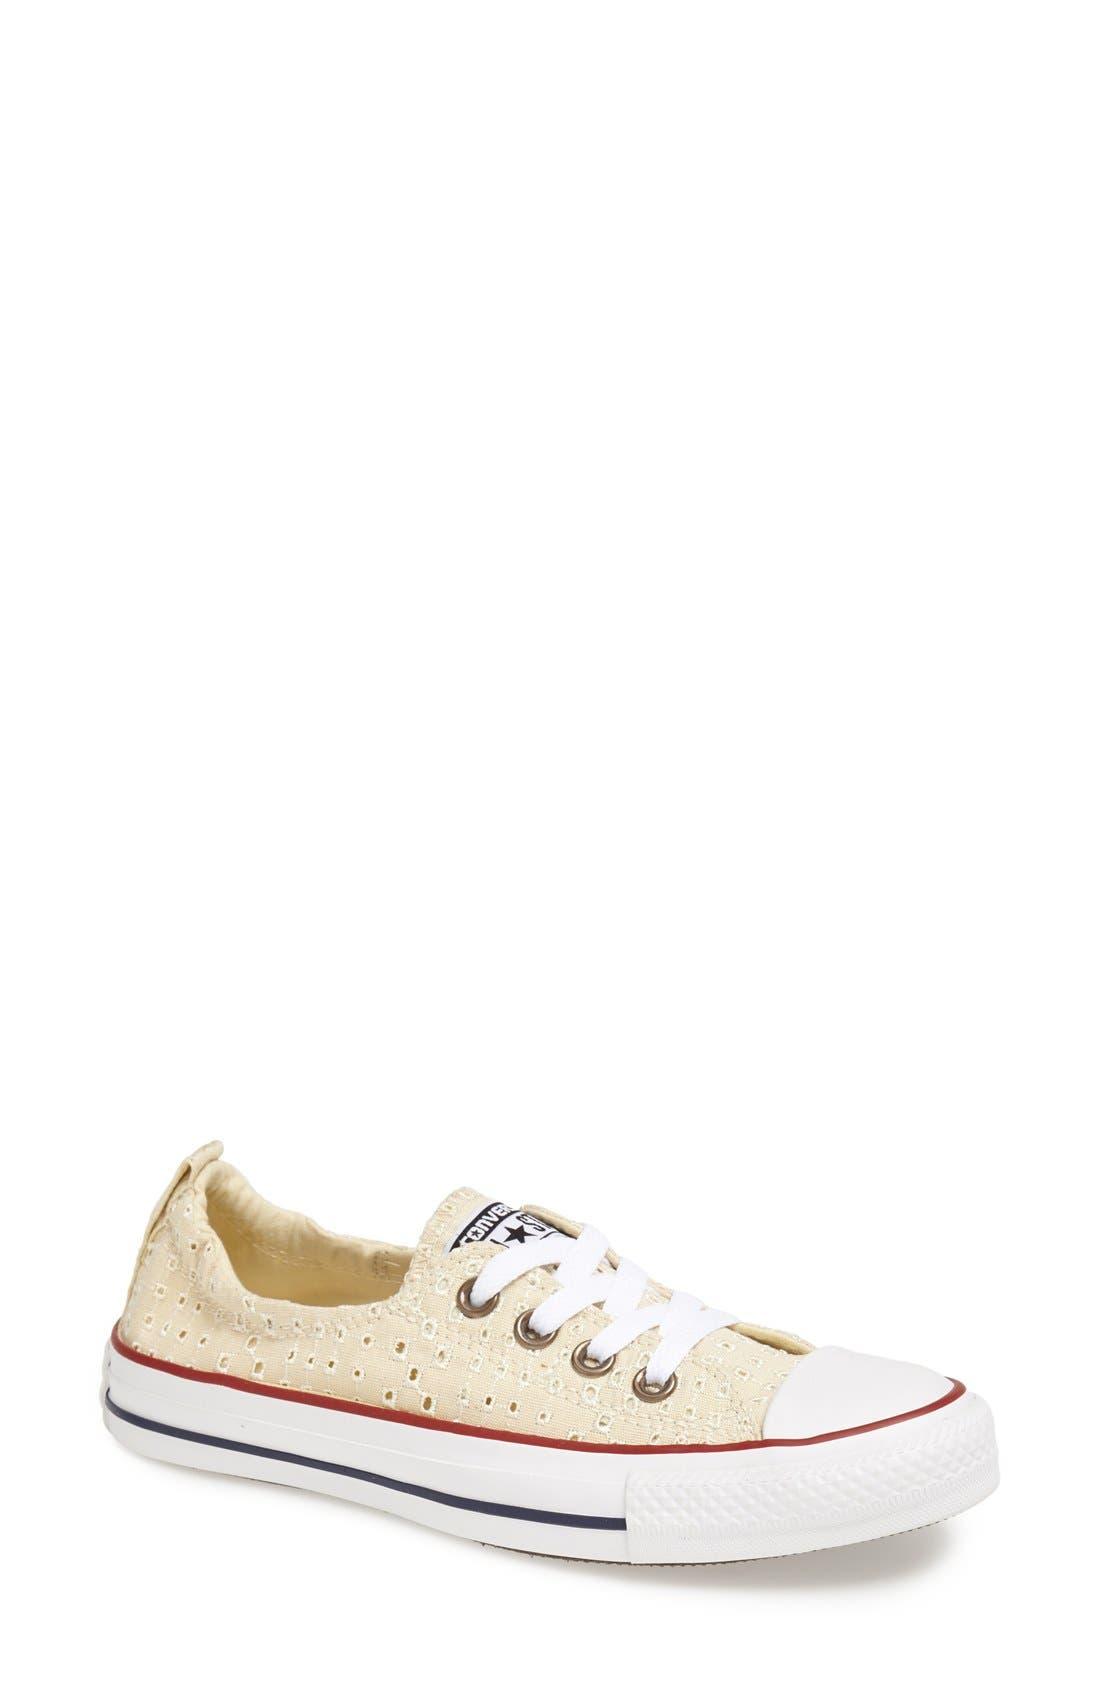 Main Image - Converse Chuck Taylor® 'Shoreline' Eyelet Sneaker (Women)